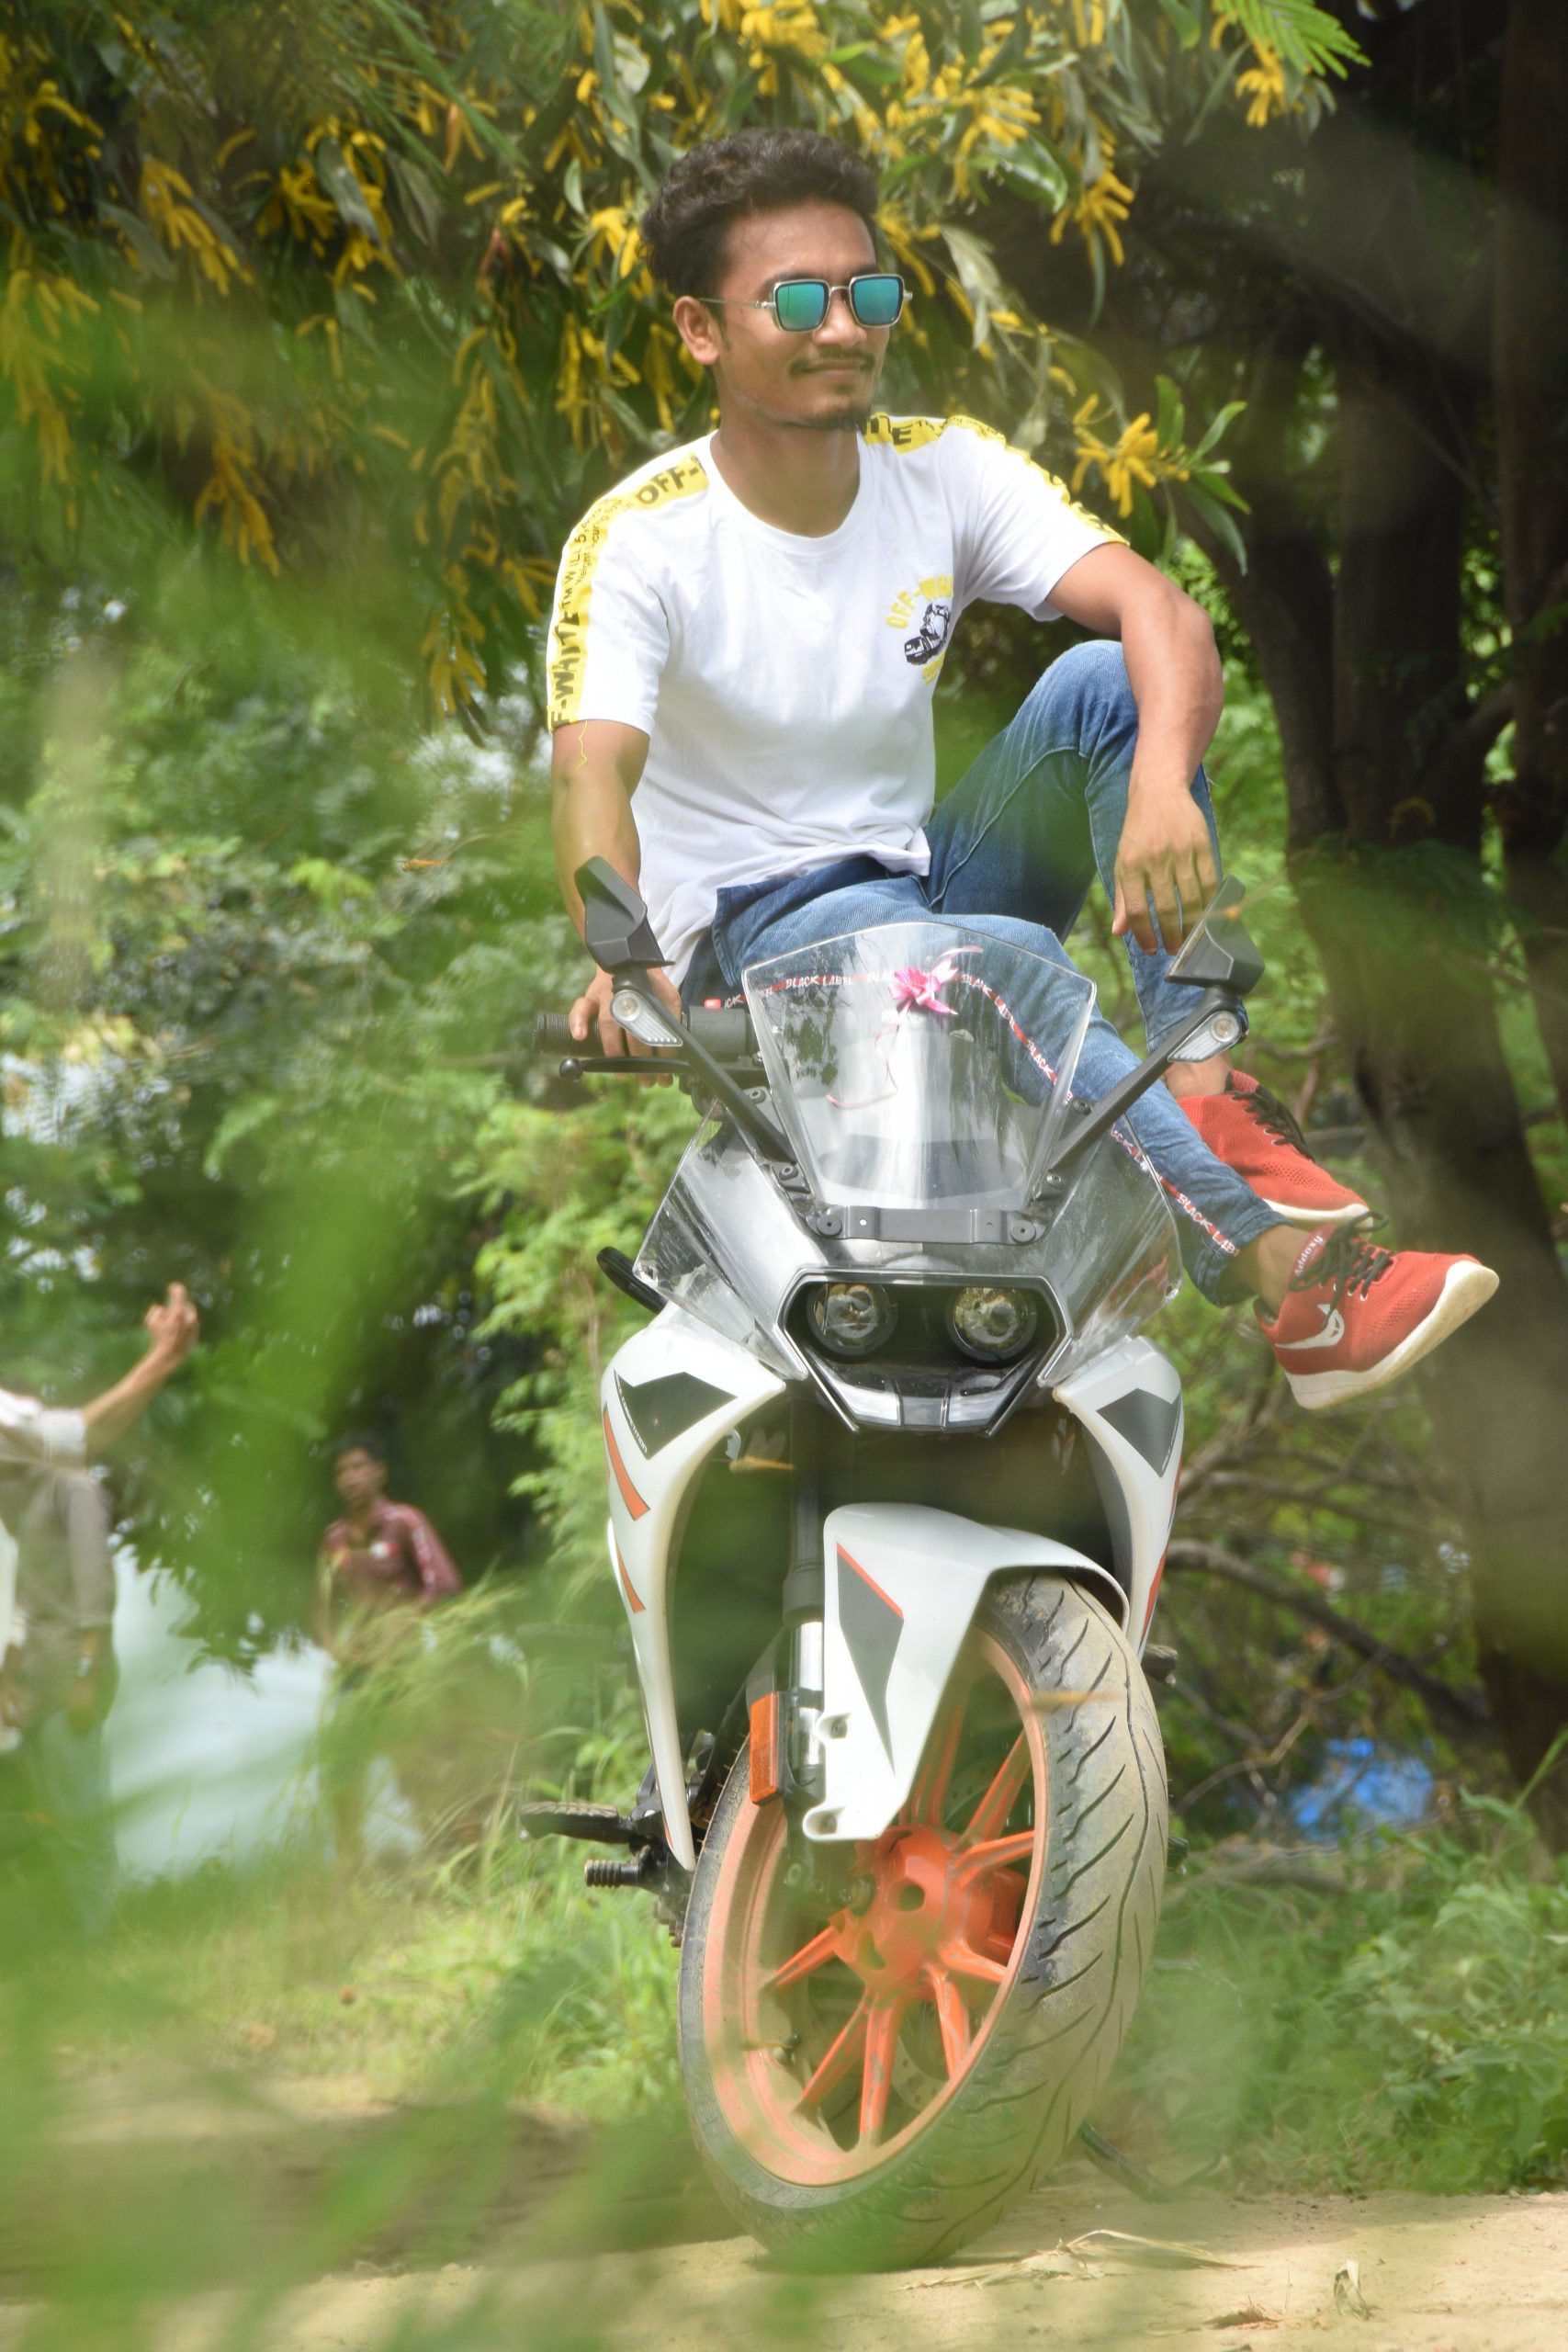 Boy sitting on KTM